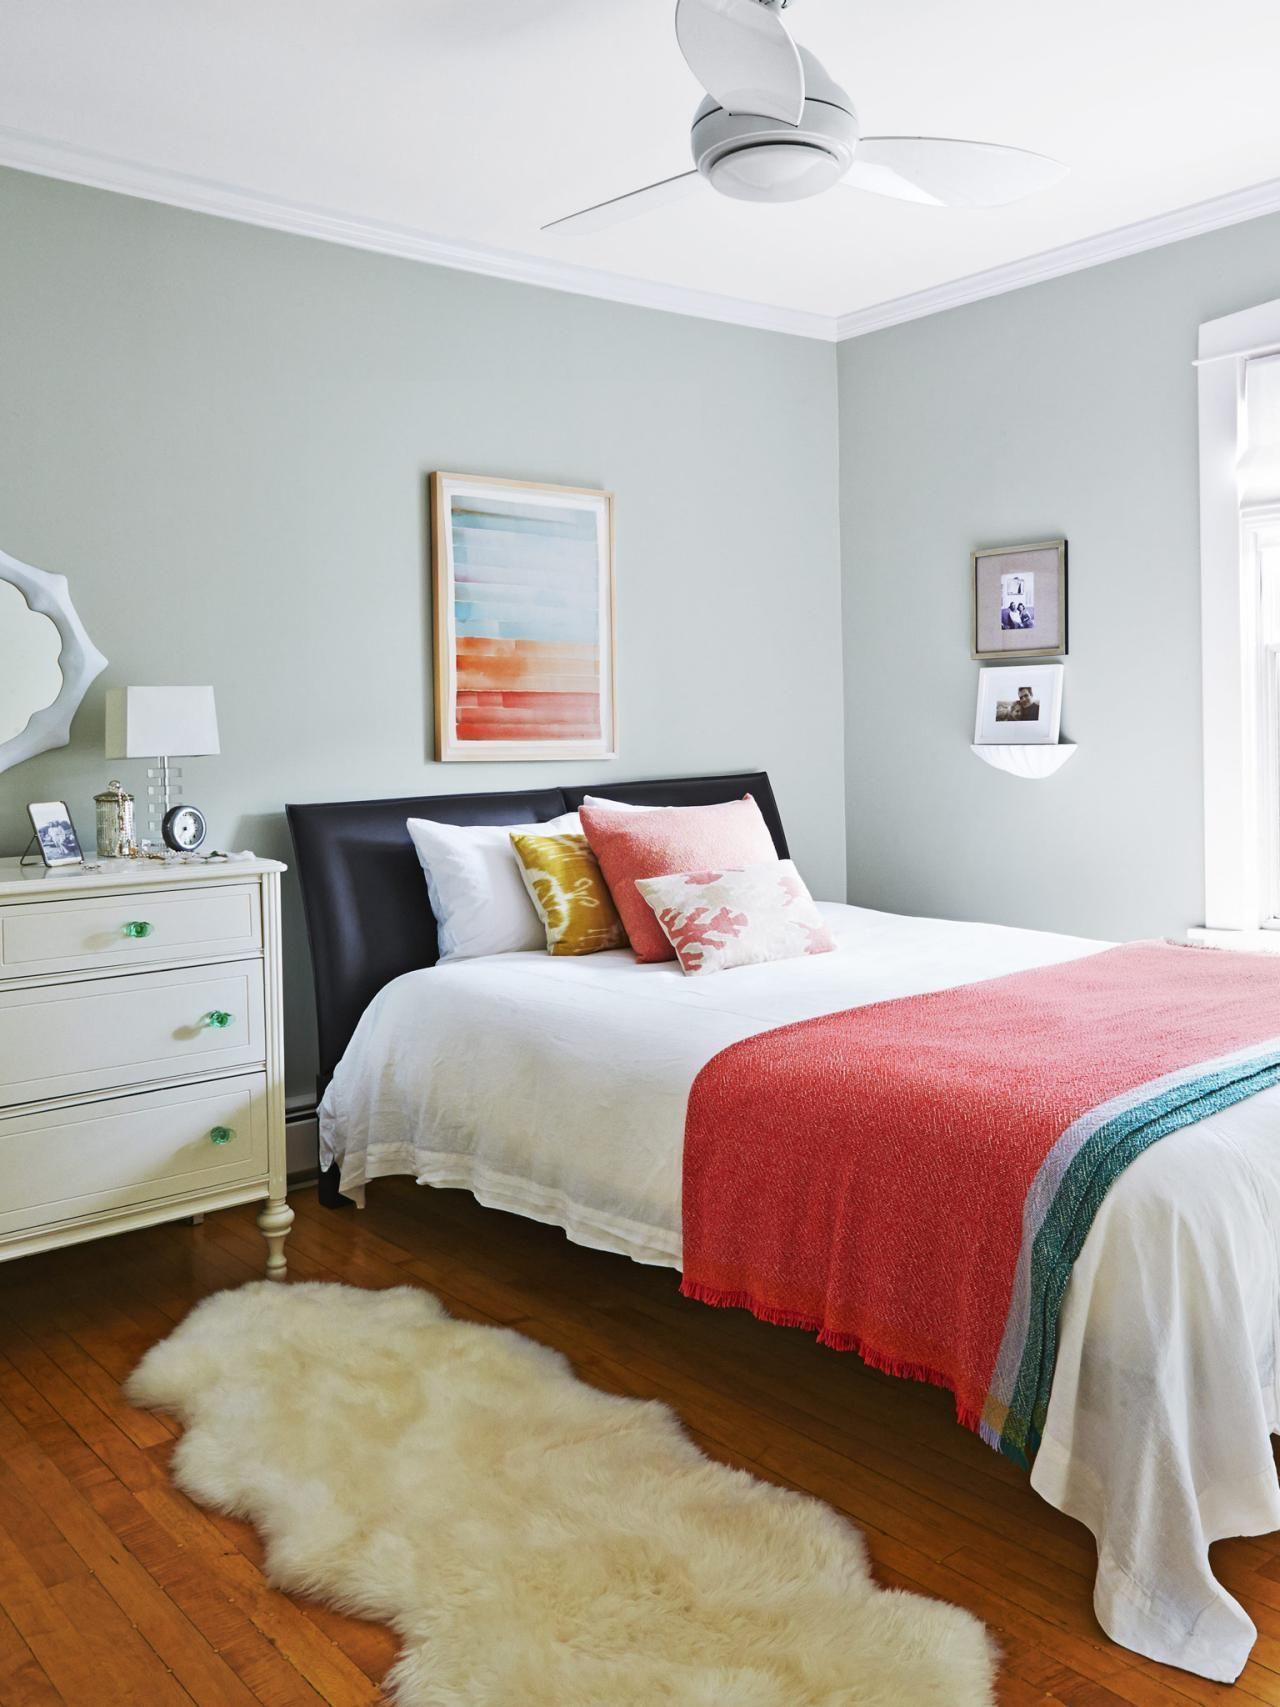 Bedroom Paint Ideas Bedroomcolor Paint Colors For Bedroom Bedroom Paint Color Ideas Home Decor Bedroom Basement Guest Rooms Home Decor Bedroom paint color ideas